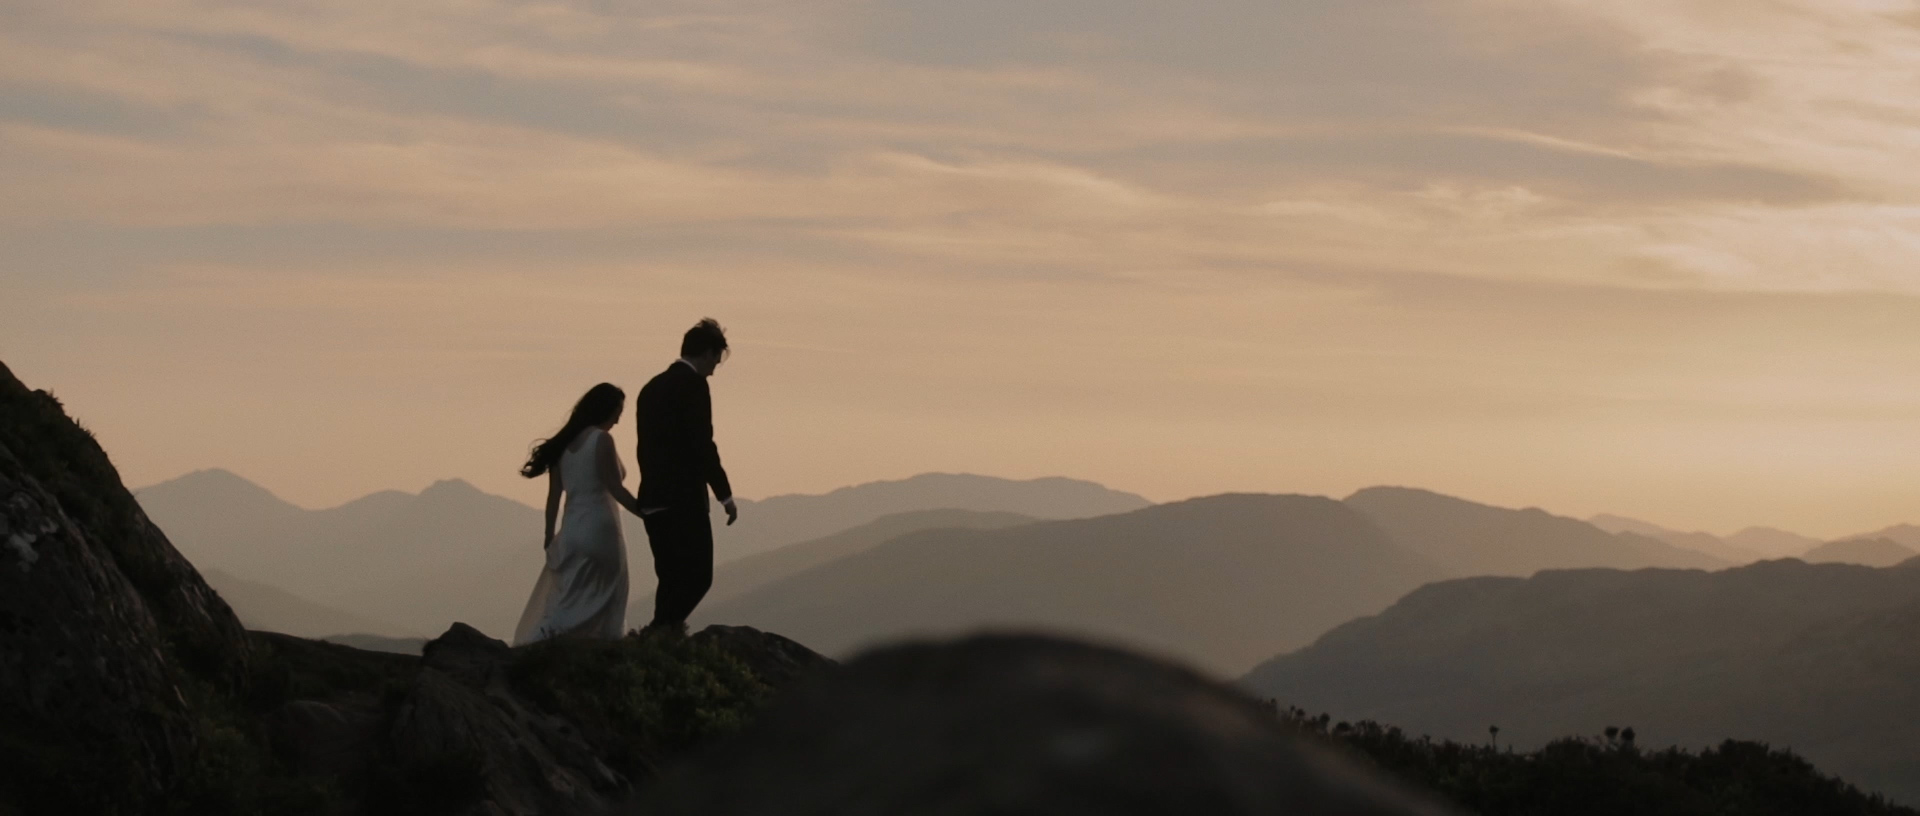 edinburgh-wedding-videographer_LL_01.jpg